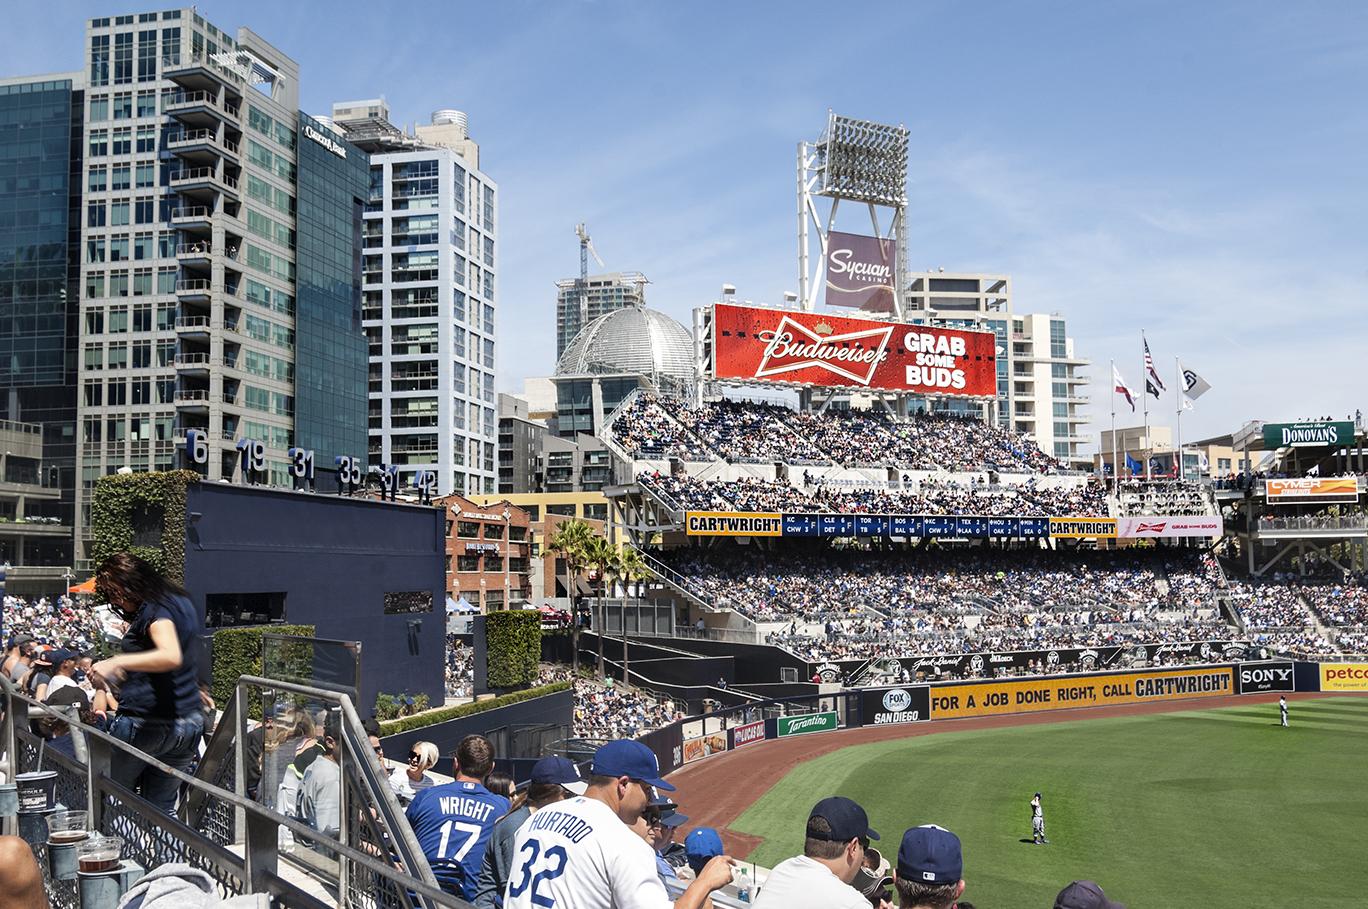 Padres_Dodgers_Apr26_2015_0475